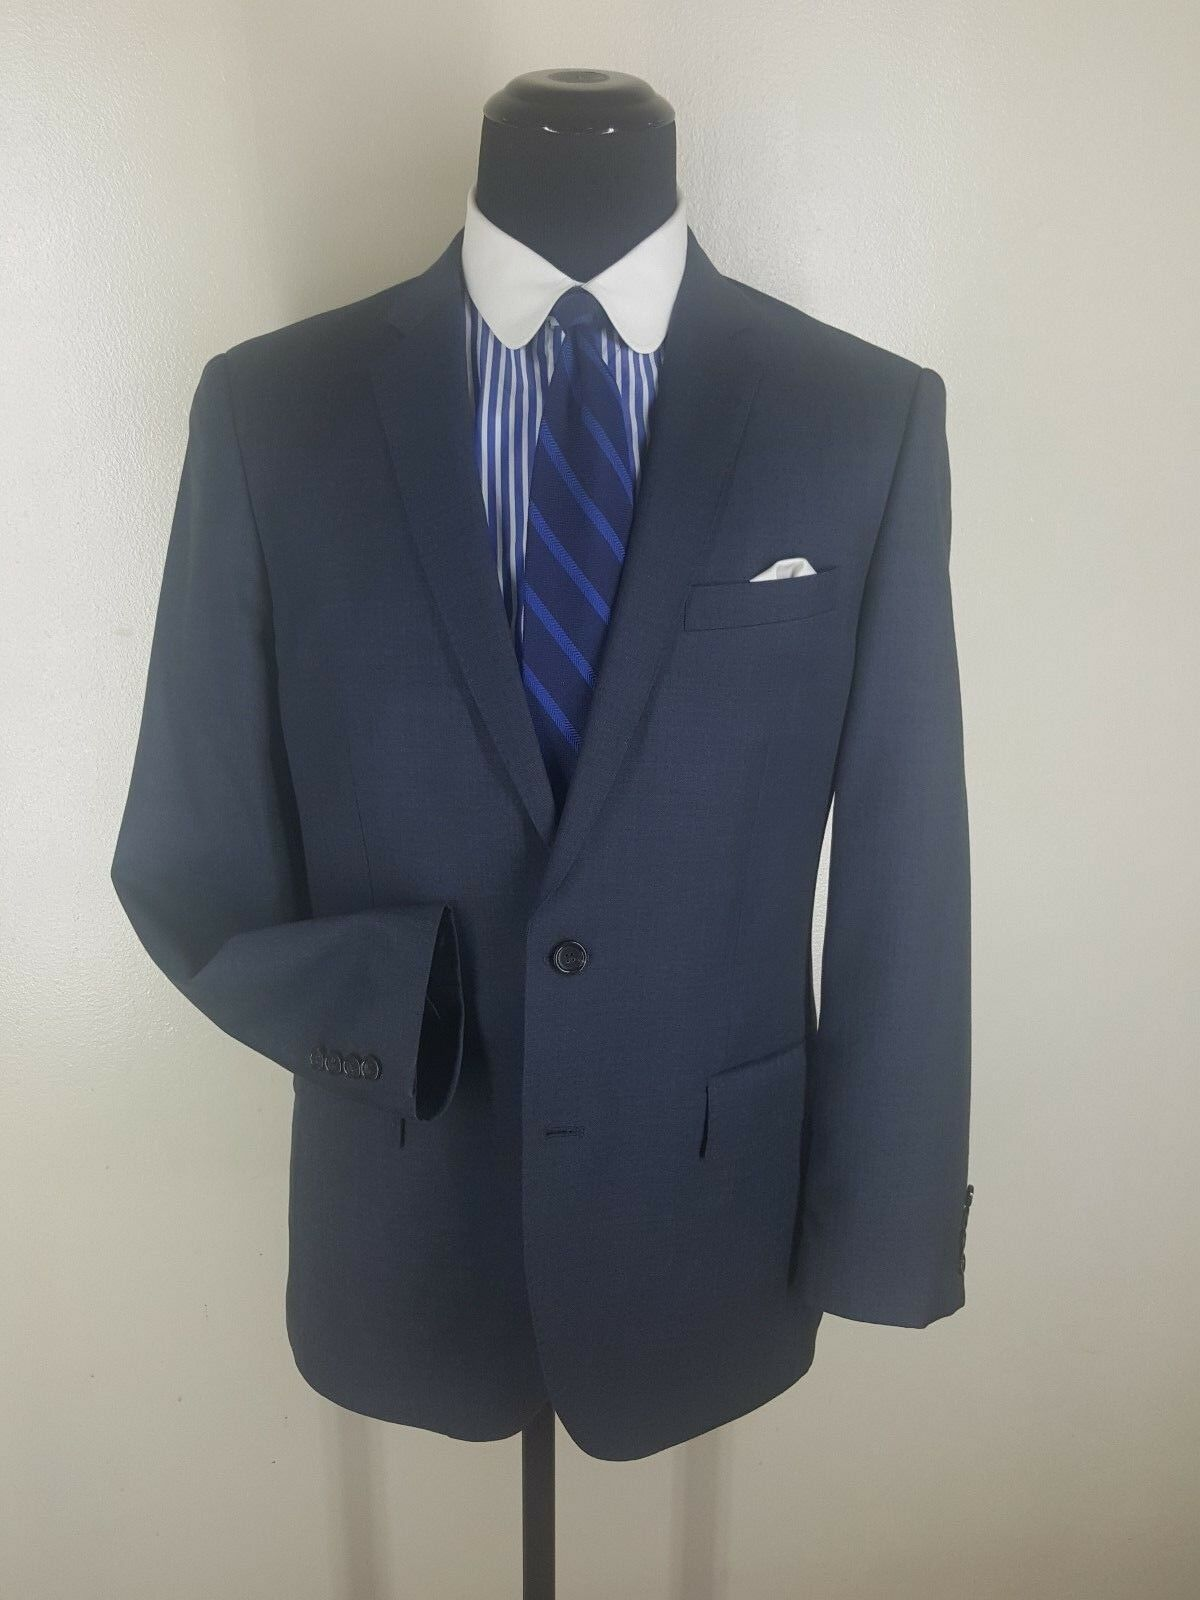 J.CREW  Recent  Ludlow Sport Coat 2 Btn. Side Vents 100% Pure Wool  Fit 42-44 R